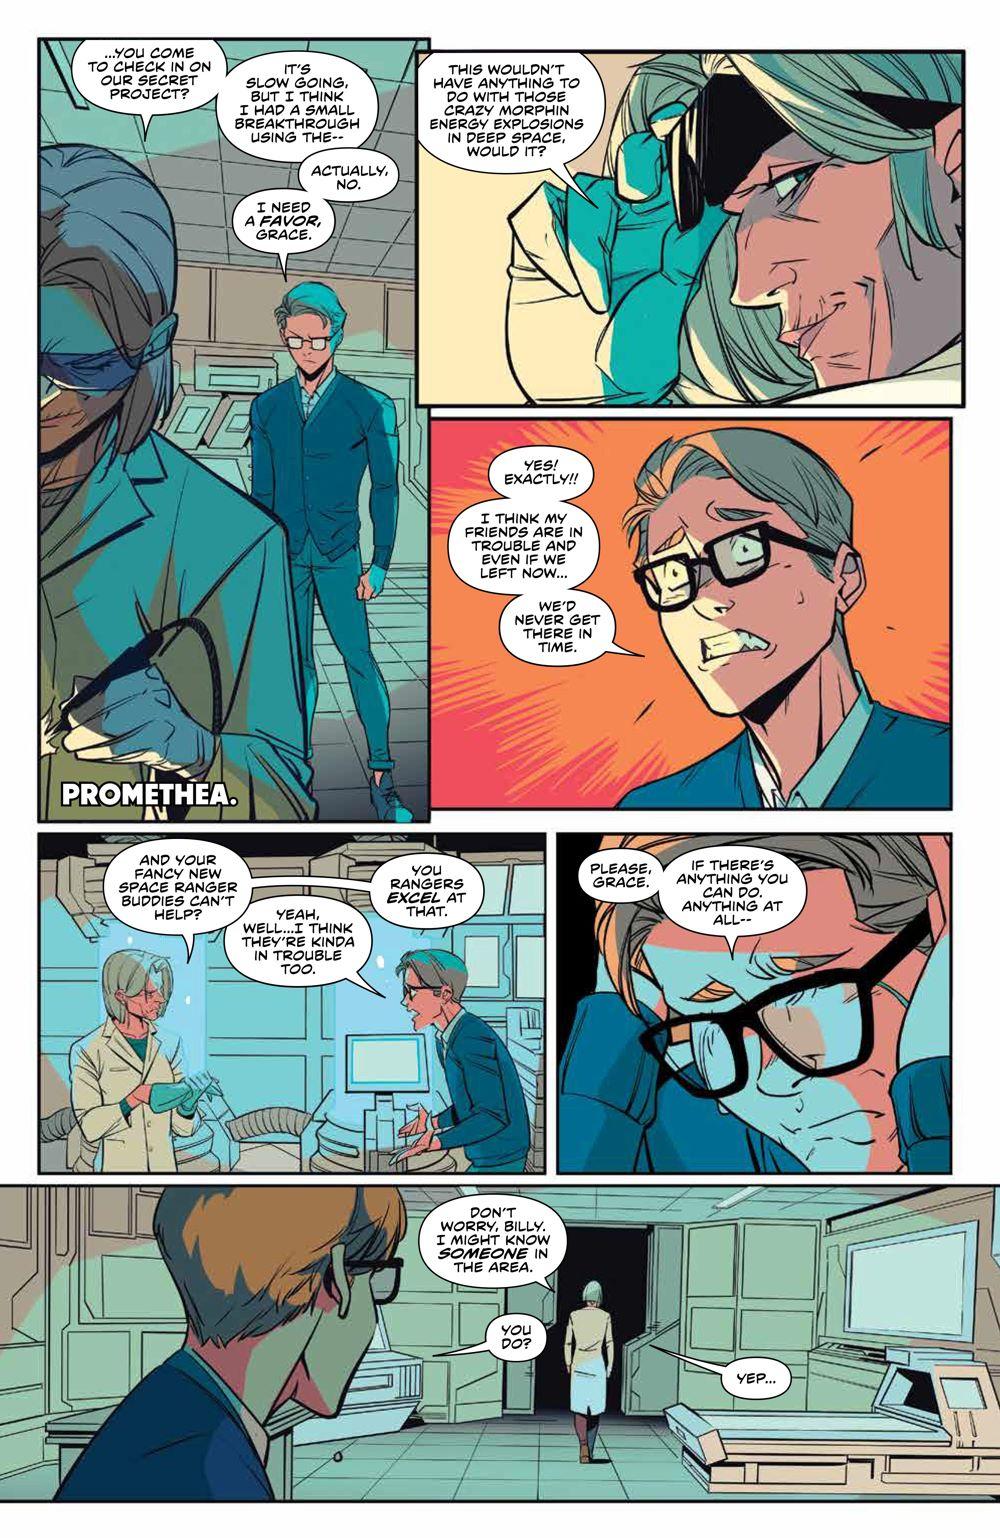 MMPR_v13_SC_PRESS_12 ComicList Previews: MIGHTY MORPHIN POWER RANGERS VOLUME 13 TP